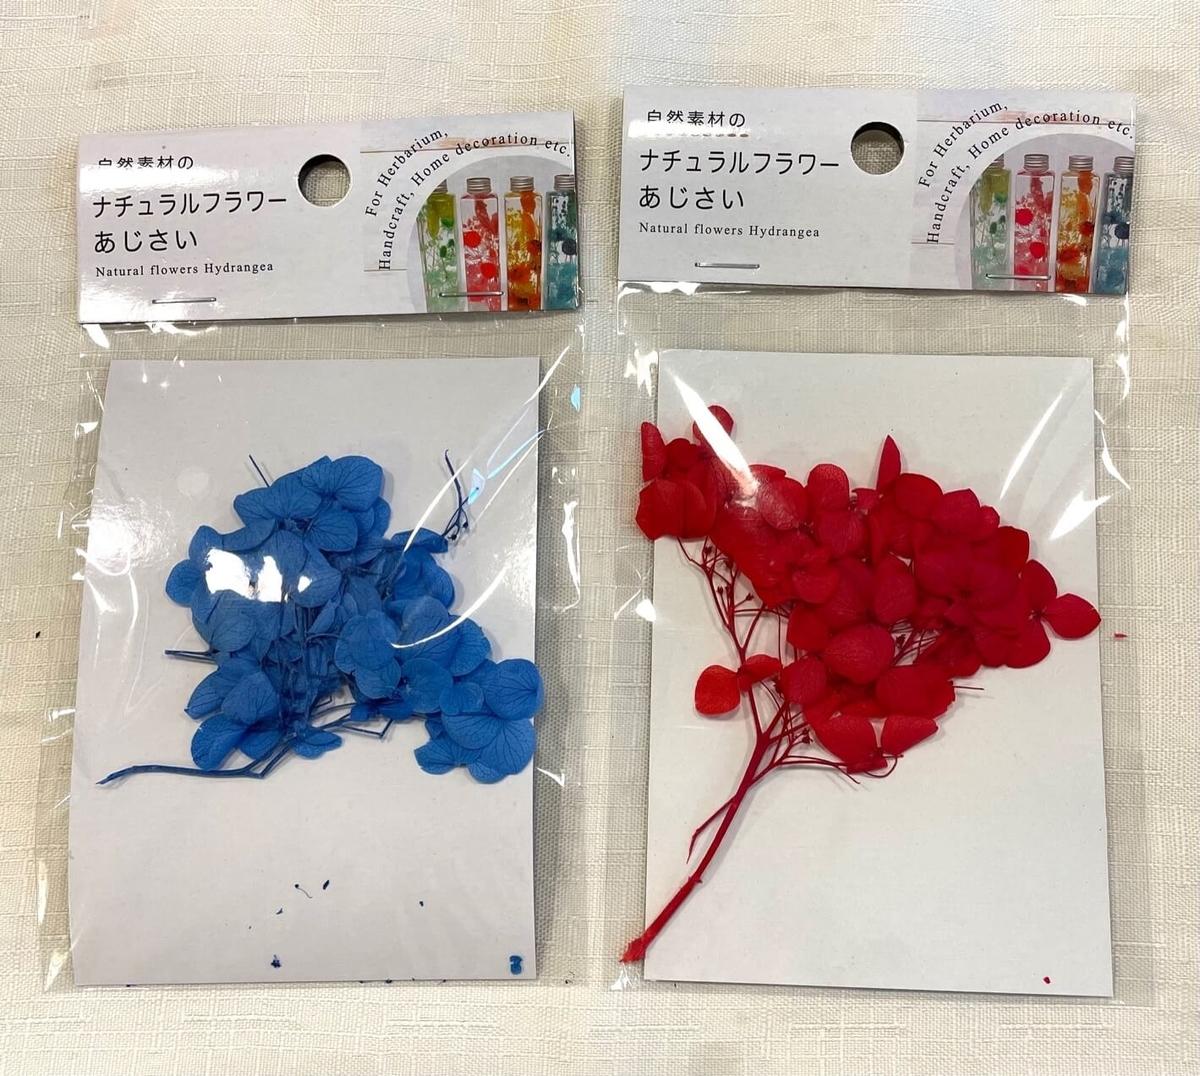 f:id:ehondaisukihinamama:20210419104905j:plain